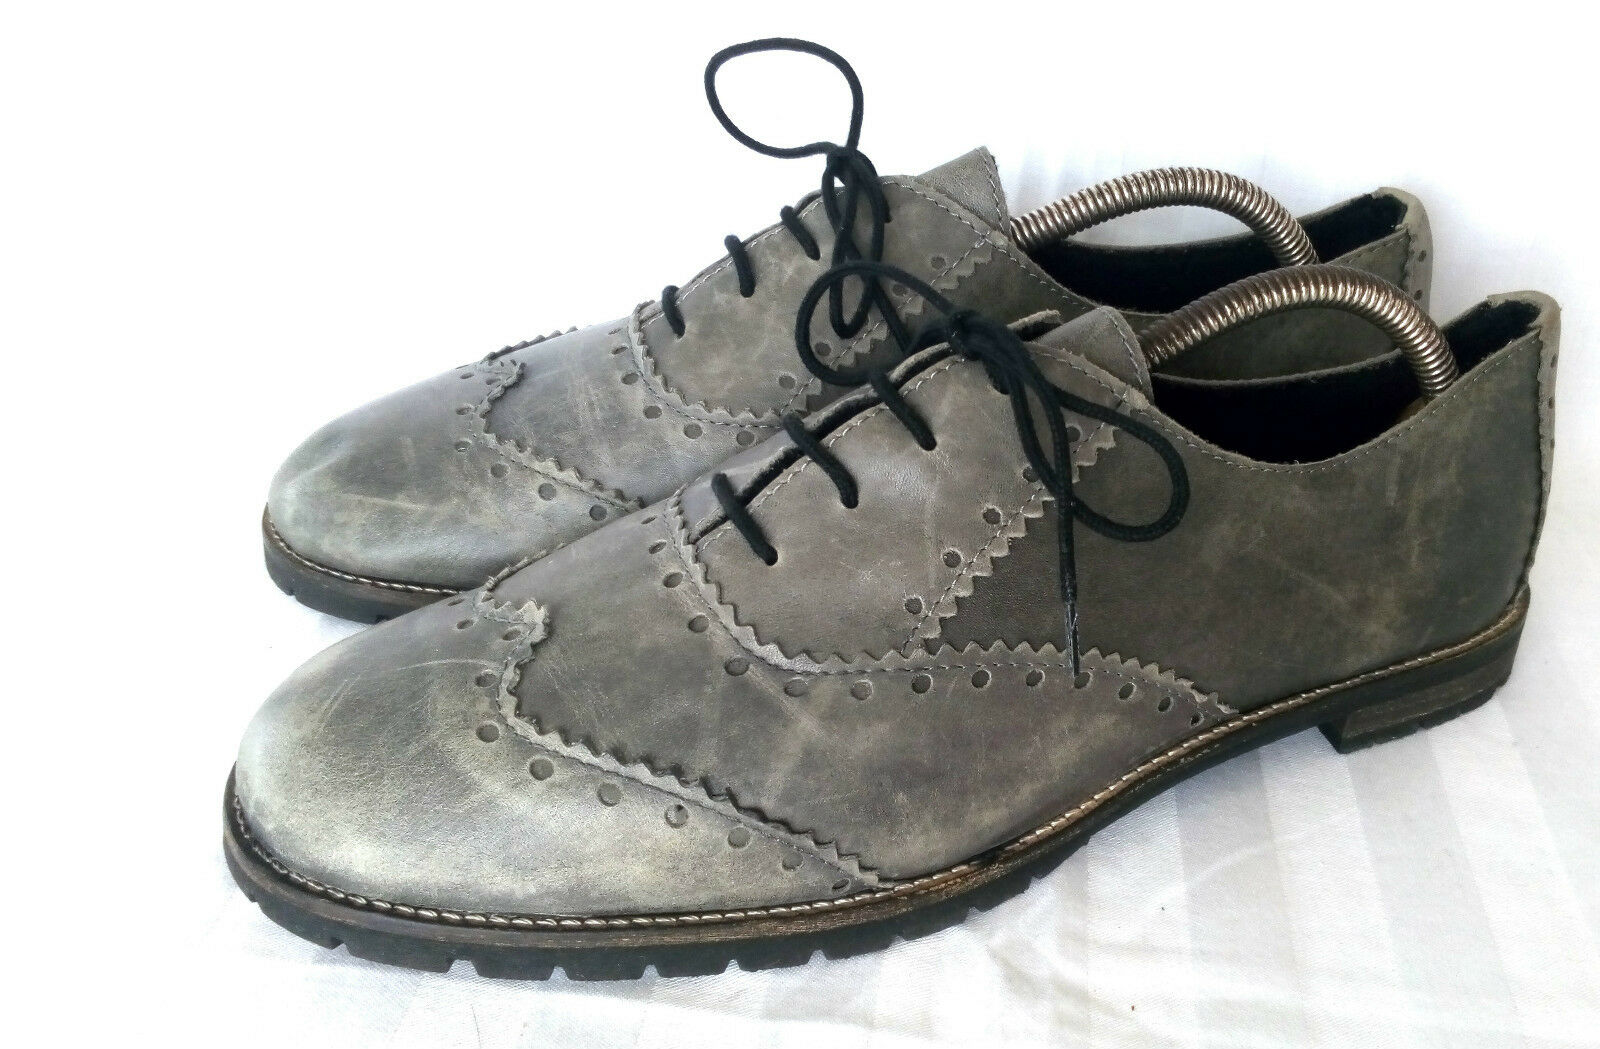 Alberto La Torre Elegante Oxford Jeans Herren Winterschuhe Warm Leder Grau 42